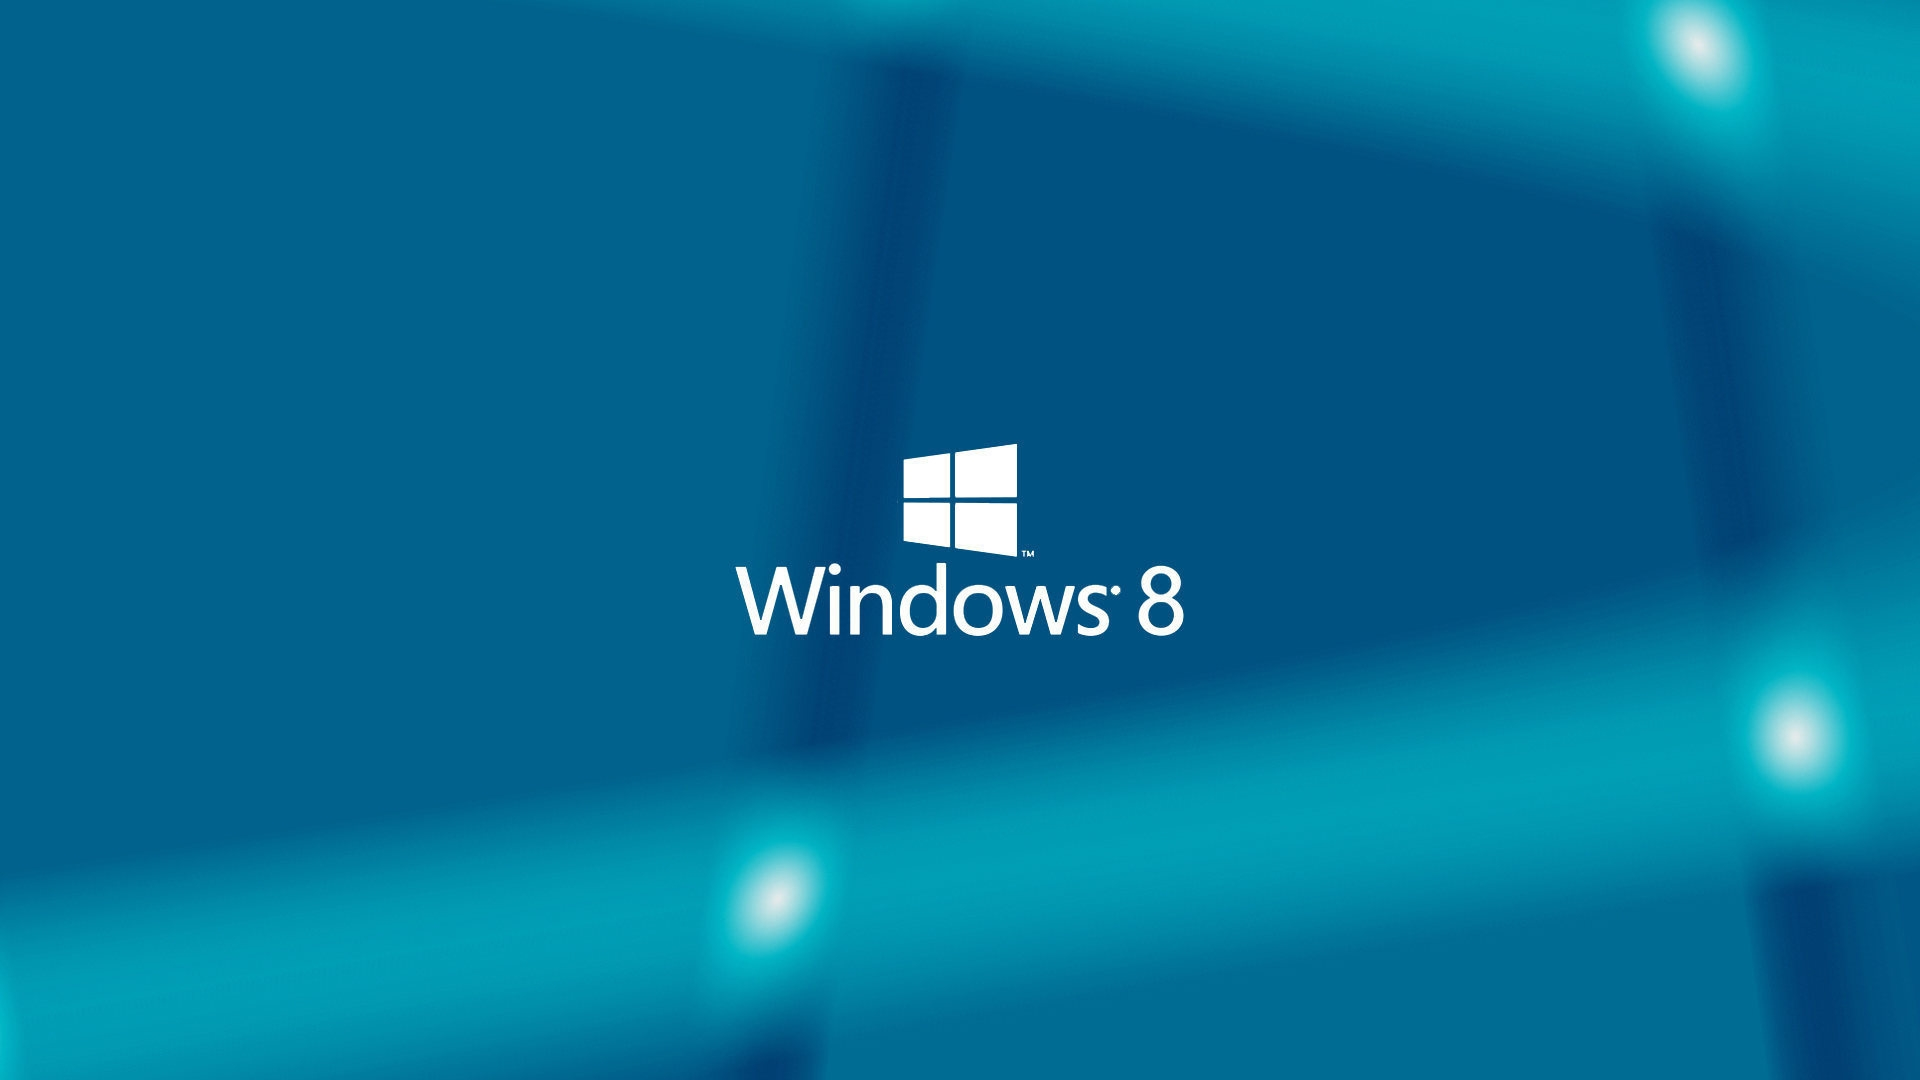 Full HD 1080p Windows 8 Wallpapers HD, Desktop Backgrounds